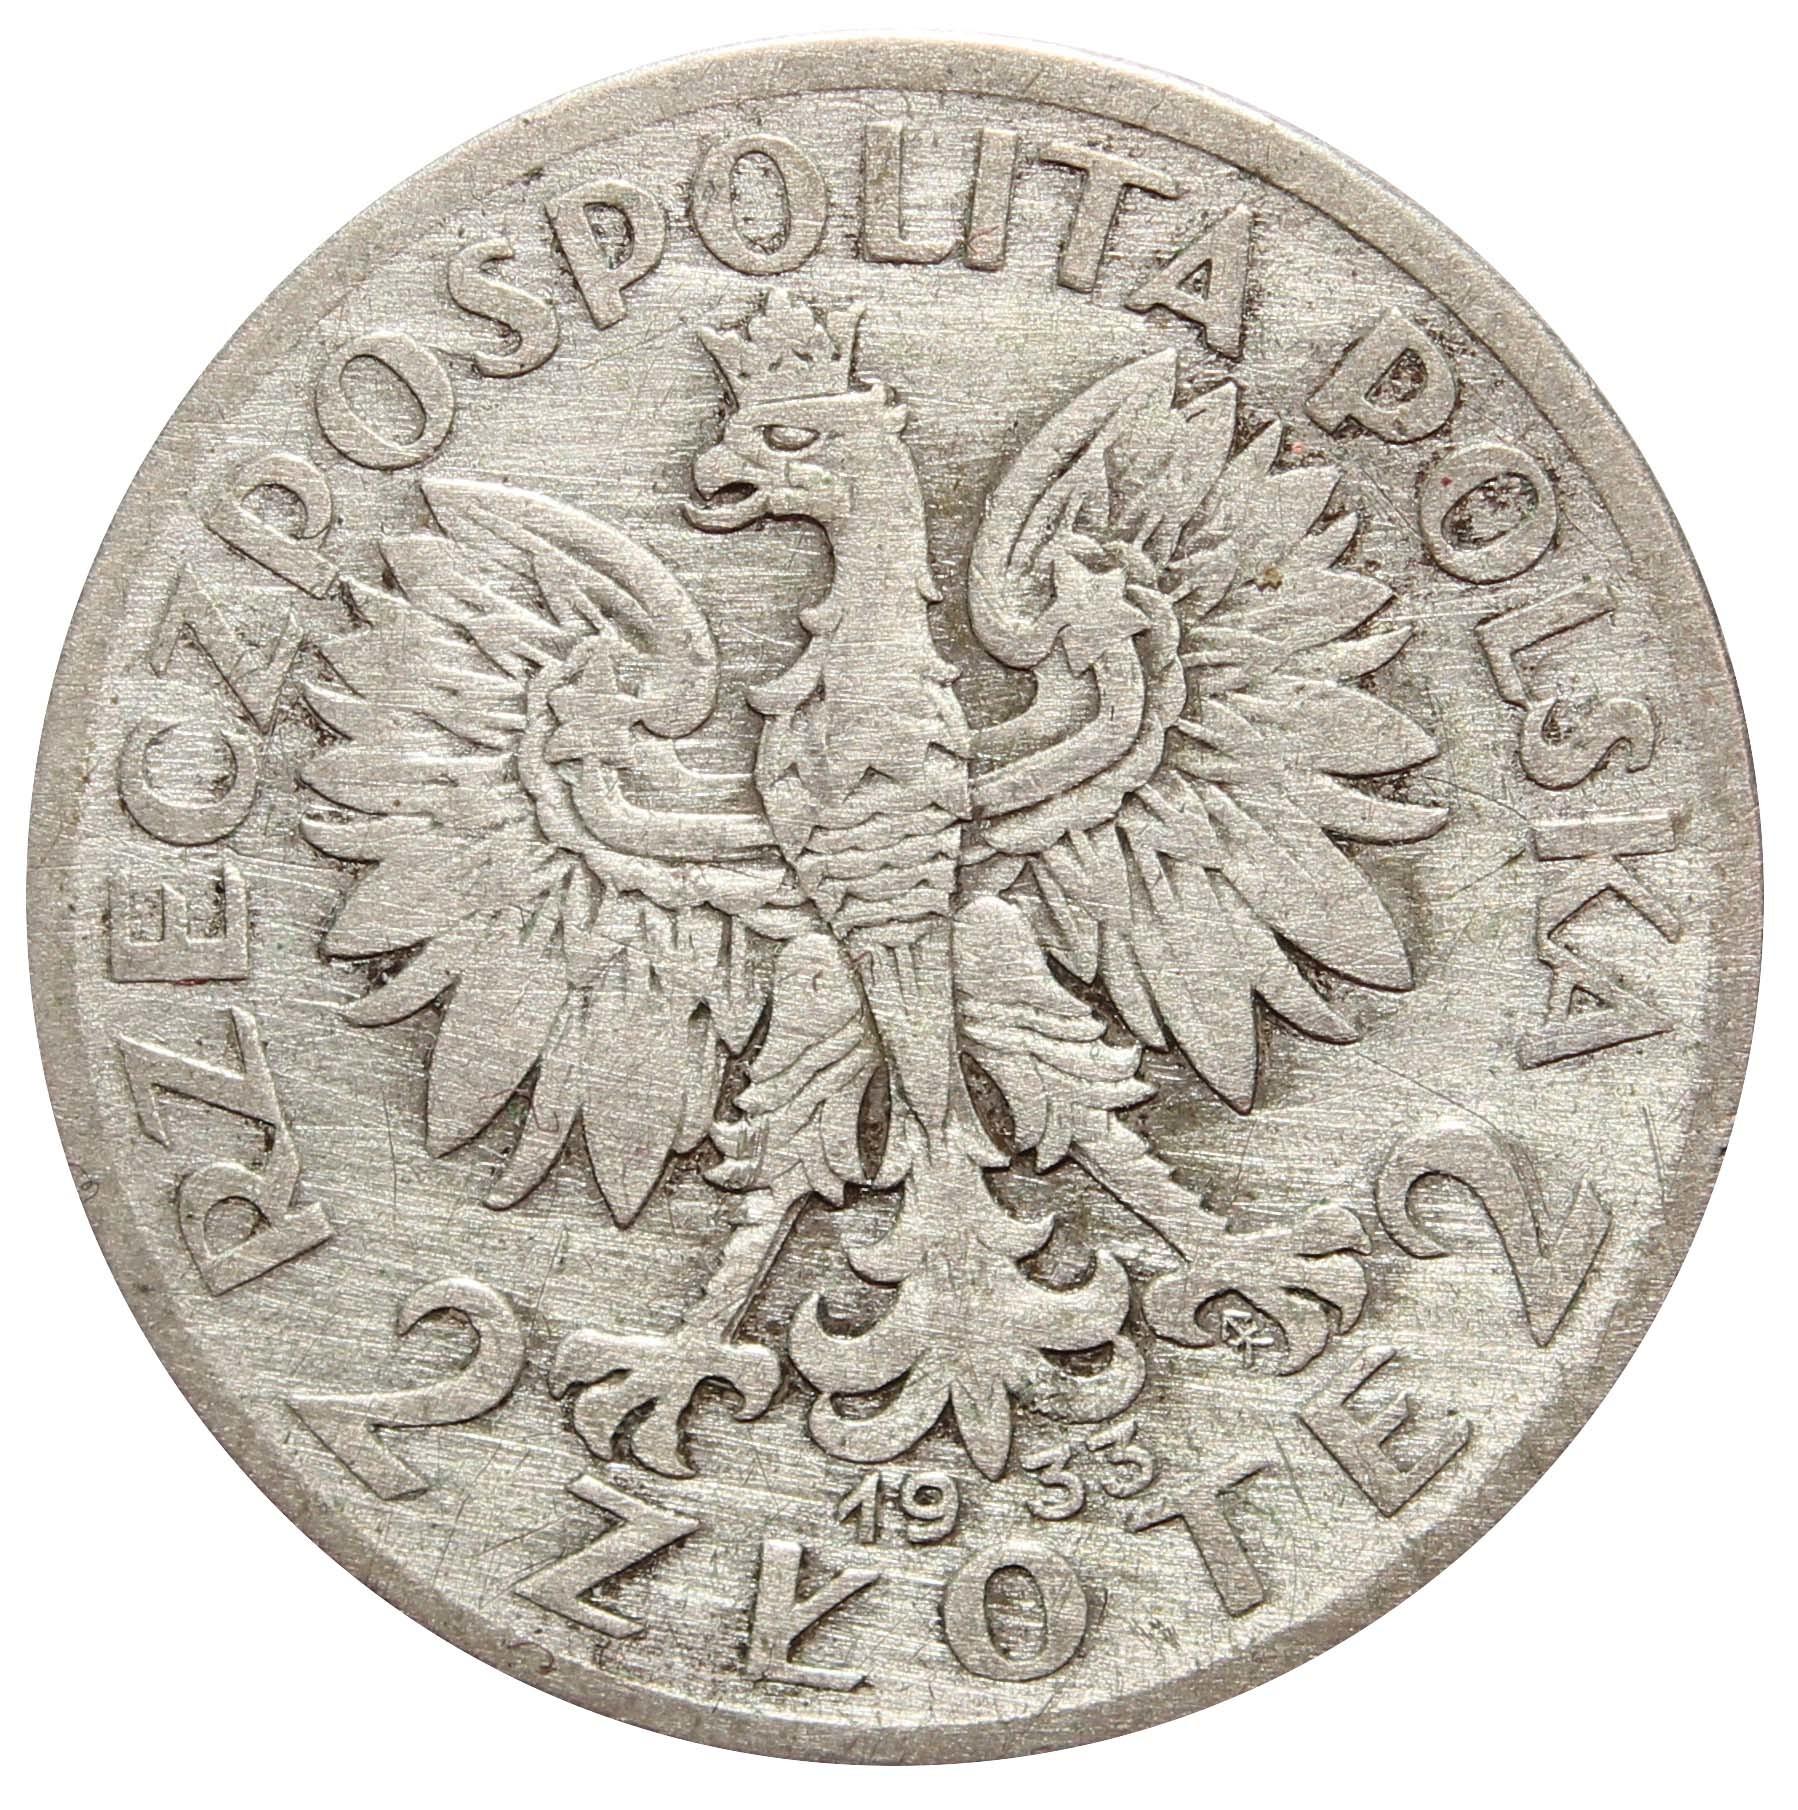 2 золотых. Ядвига. Польша. 1933 год. VF-XF